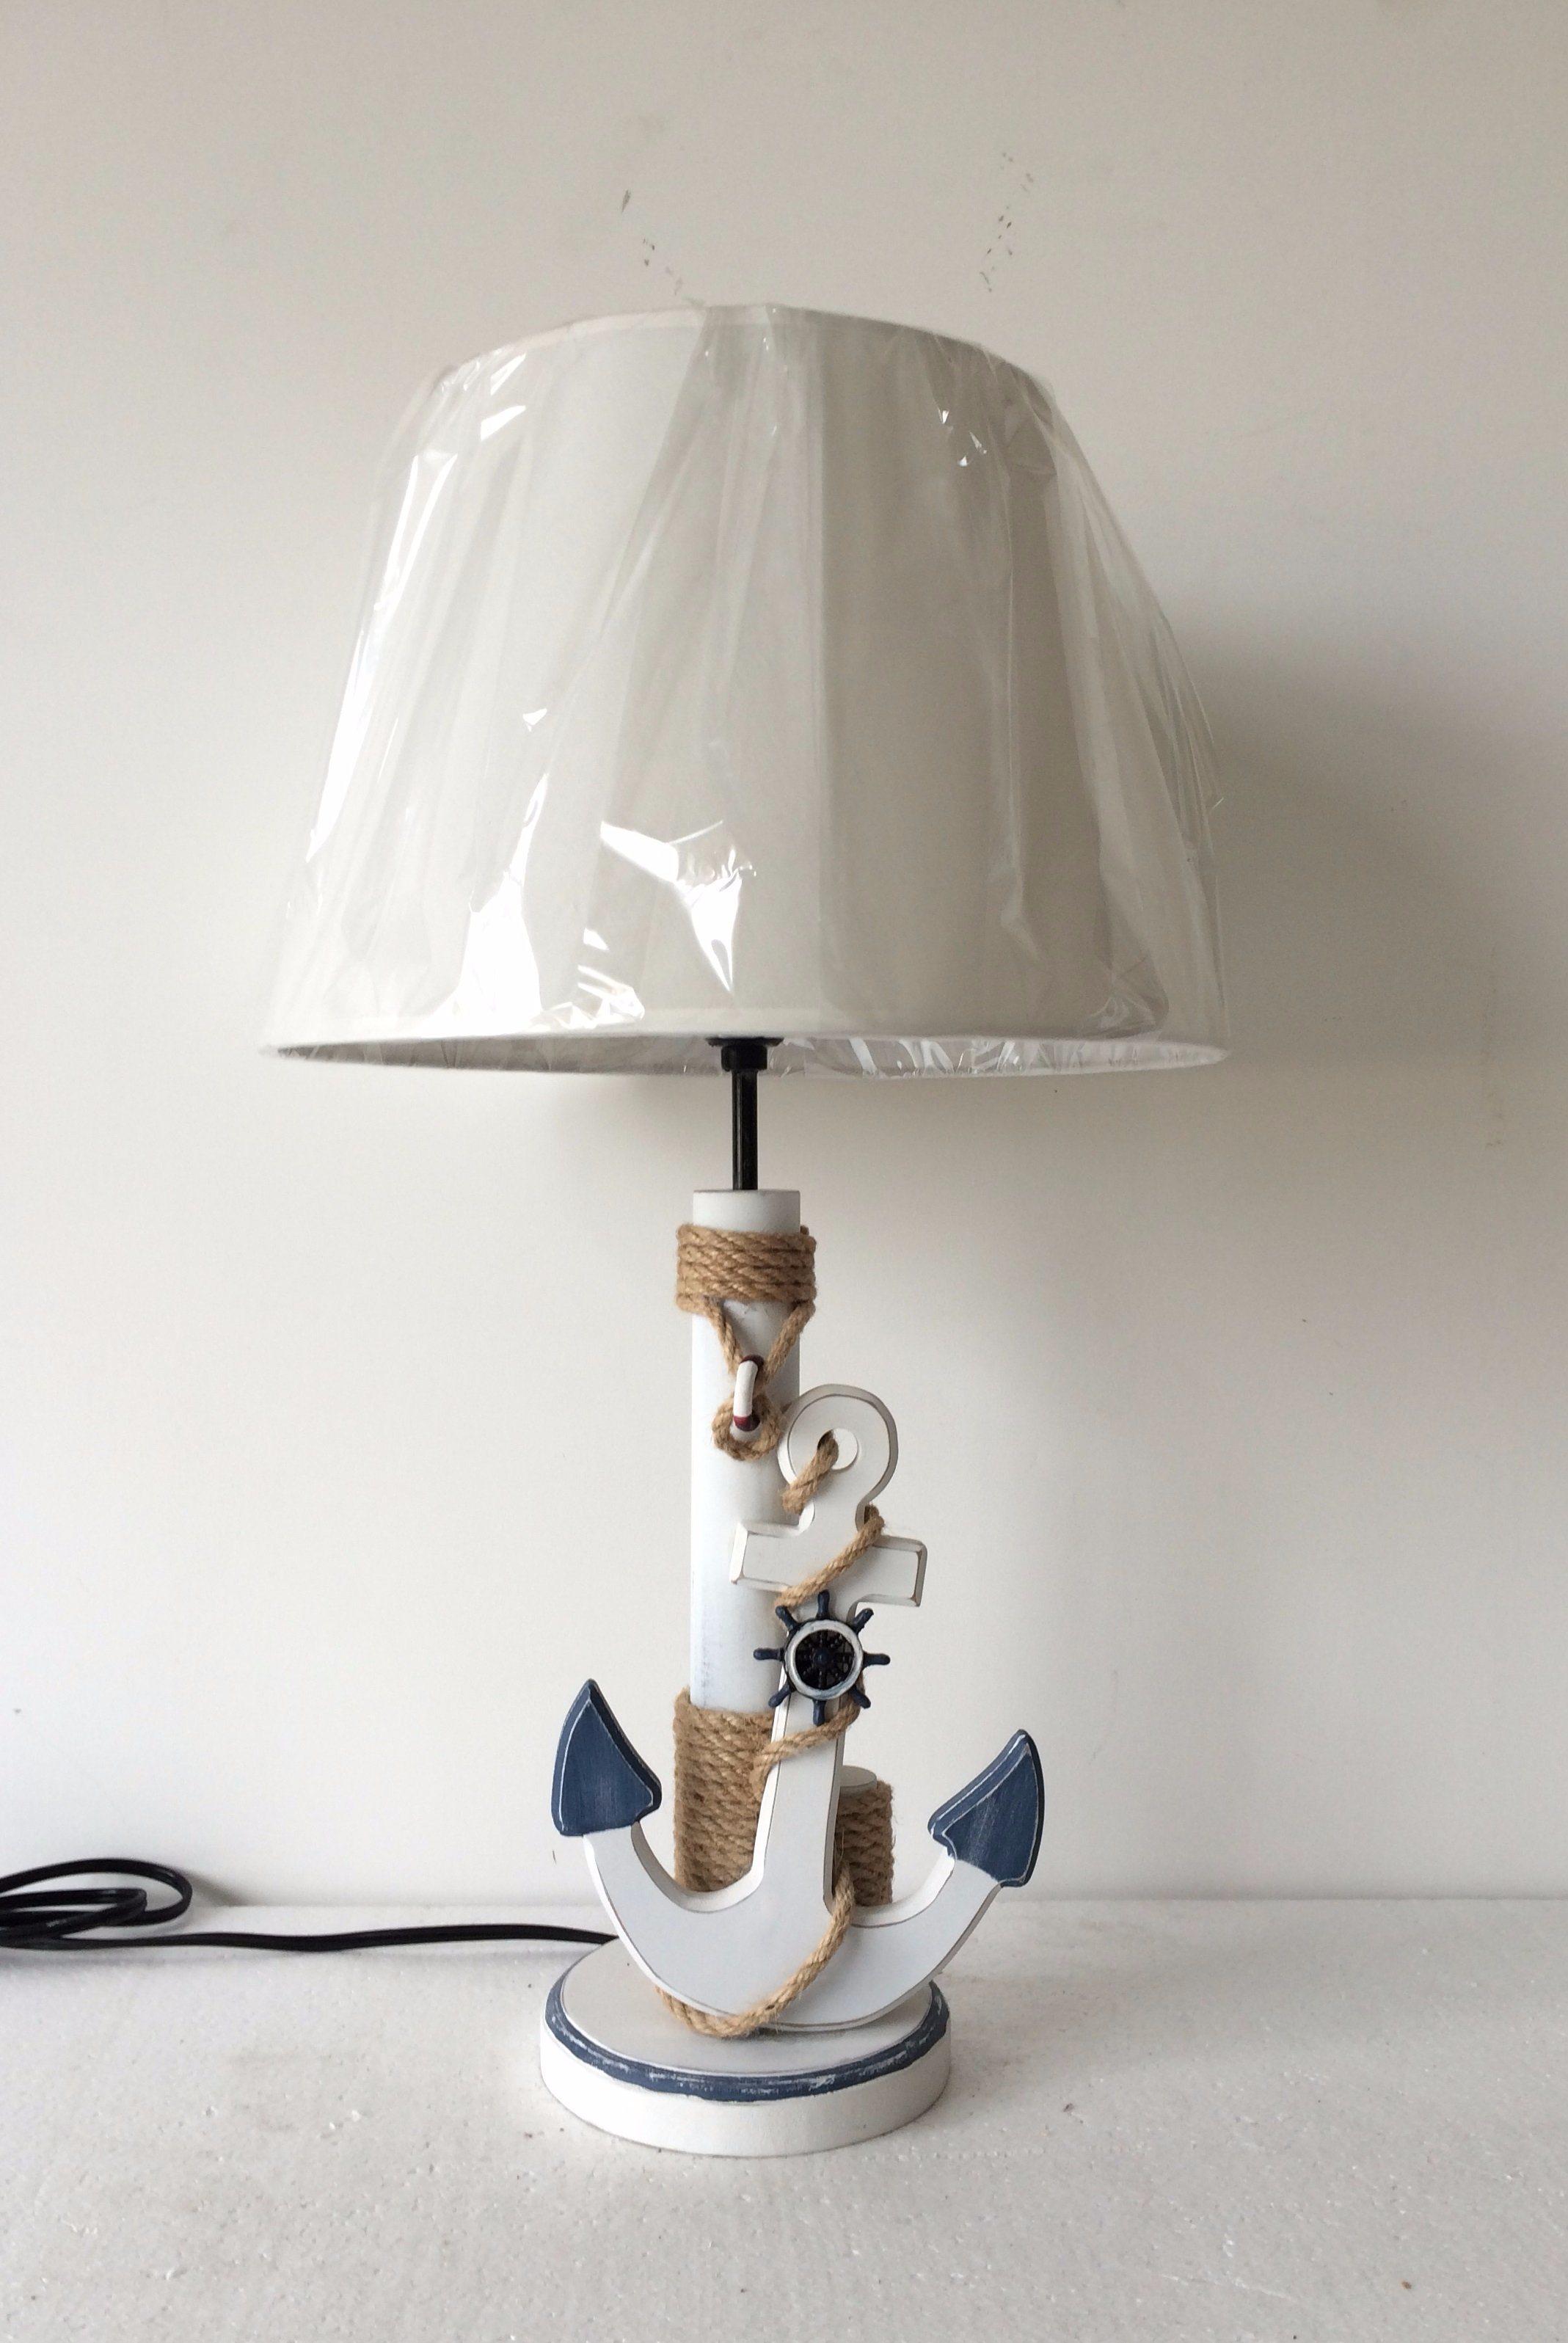 hot item jf naut anchor table lamp